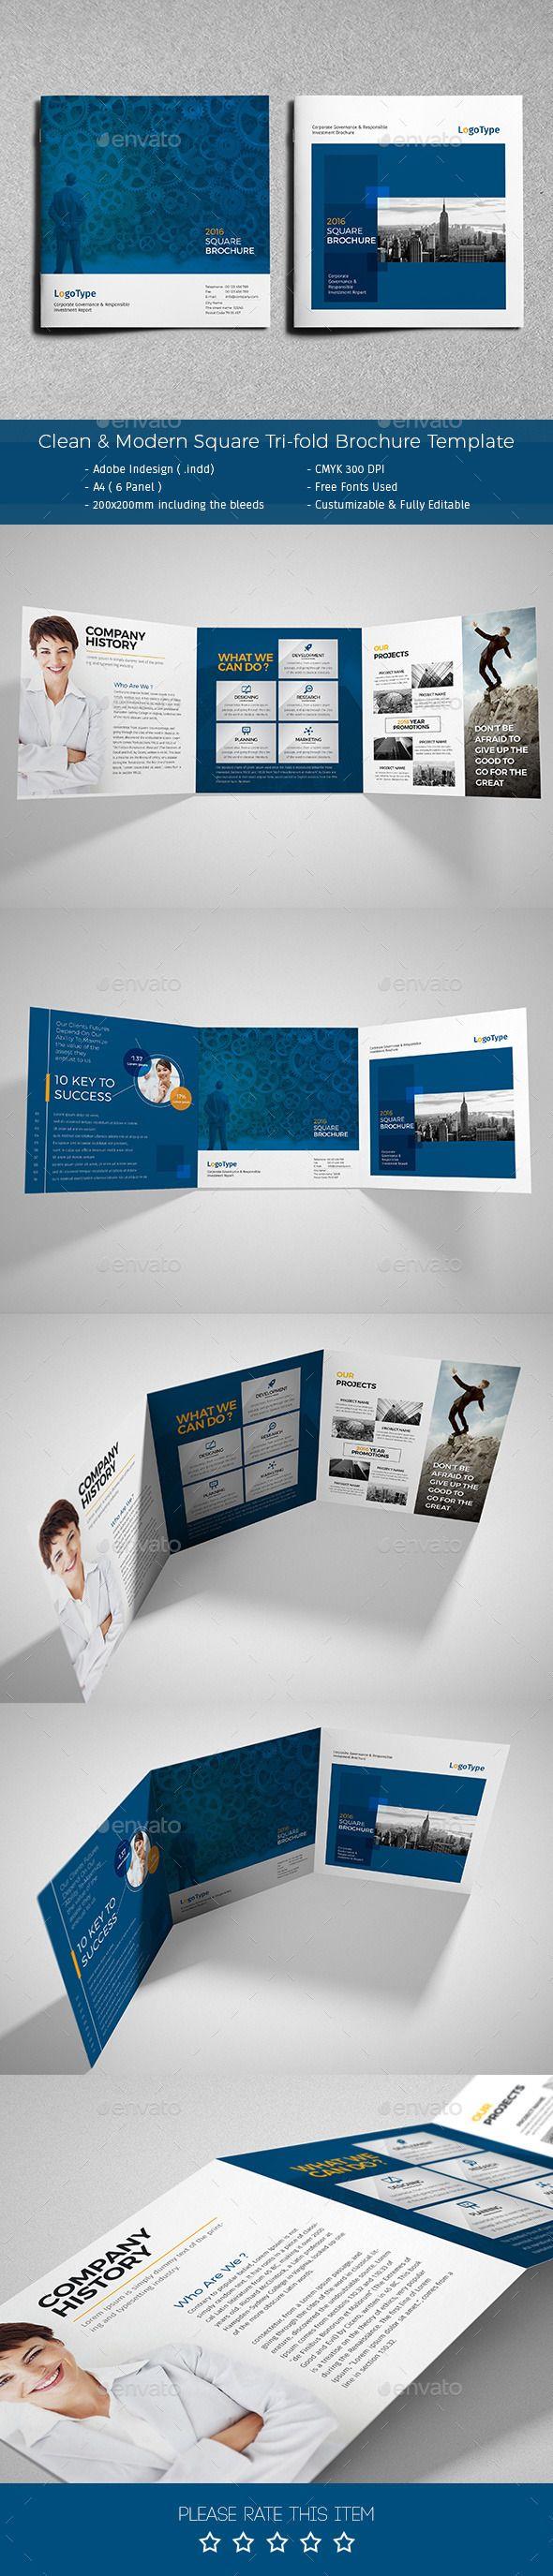 Clean & Modern Square Tri-fold Brochure Template #design #broschüre Download: http://graphicriver.net/item/clean-modern-square-trifold-brochure/12340282?ref=ksioks